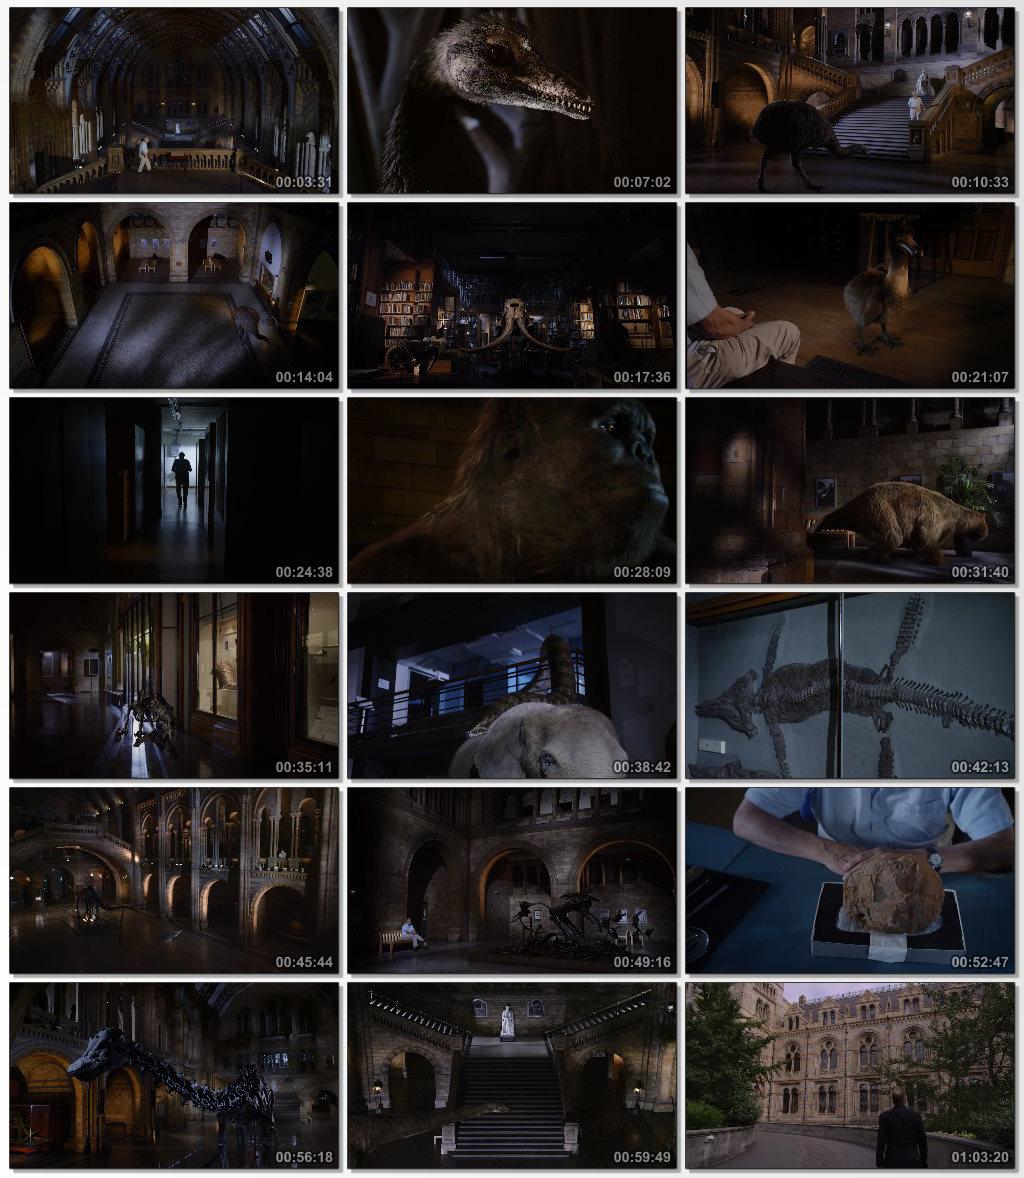 David Attenborough's Natural History Museum Alive 2014 1080p BluRay DTS x264-DON.mkv_thumbs_[2014.12.24_12.44.53]